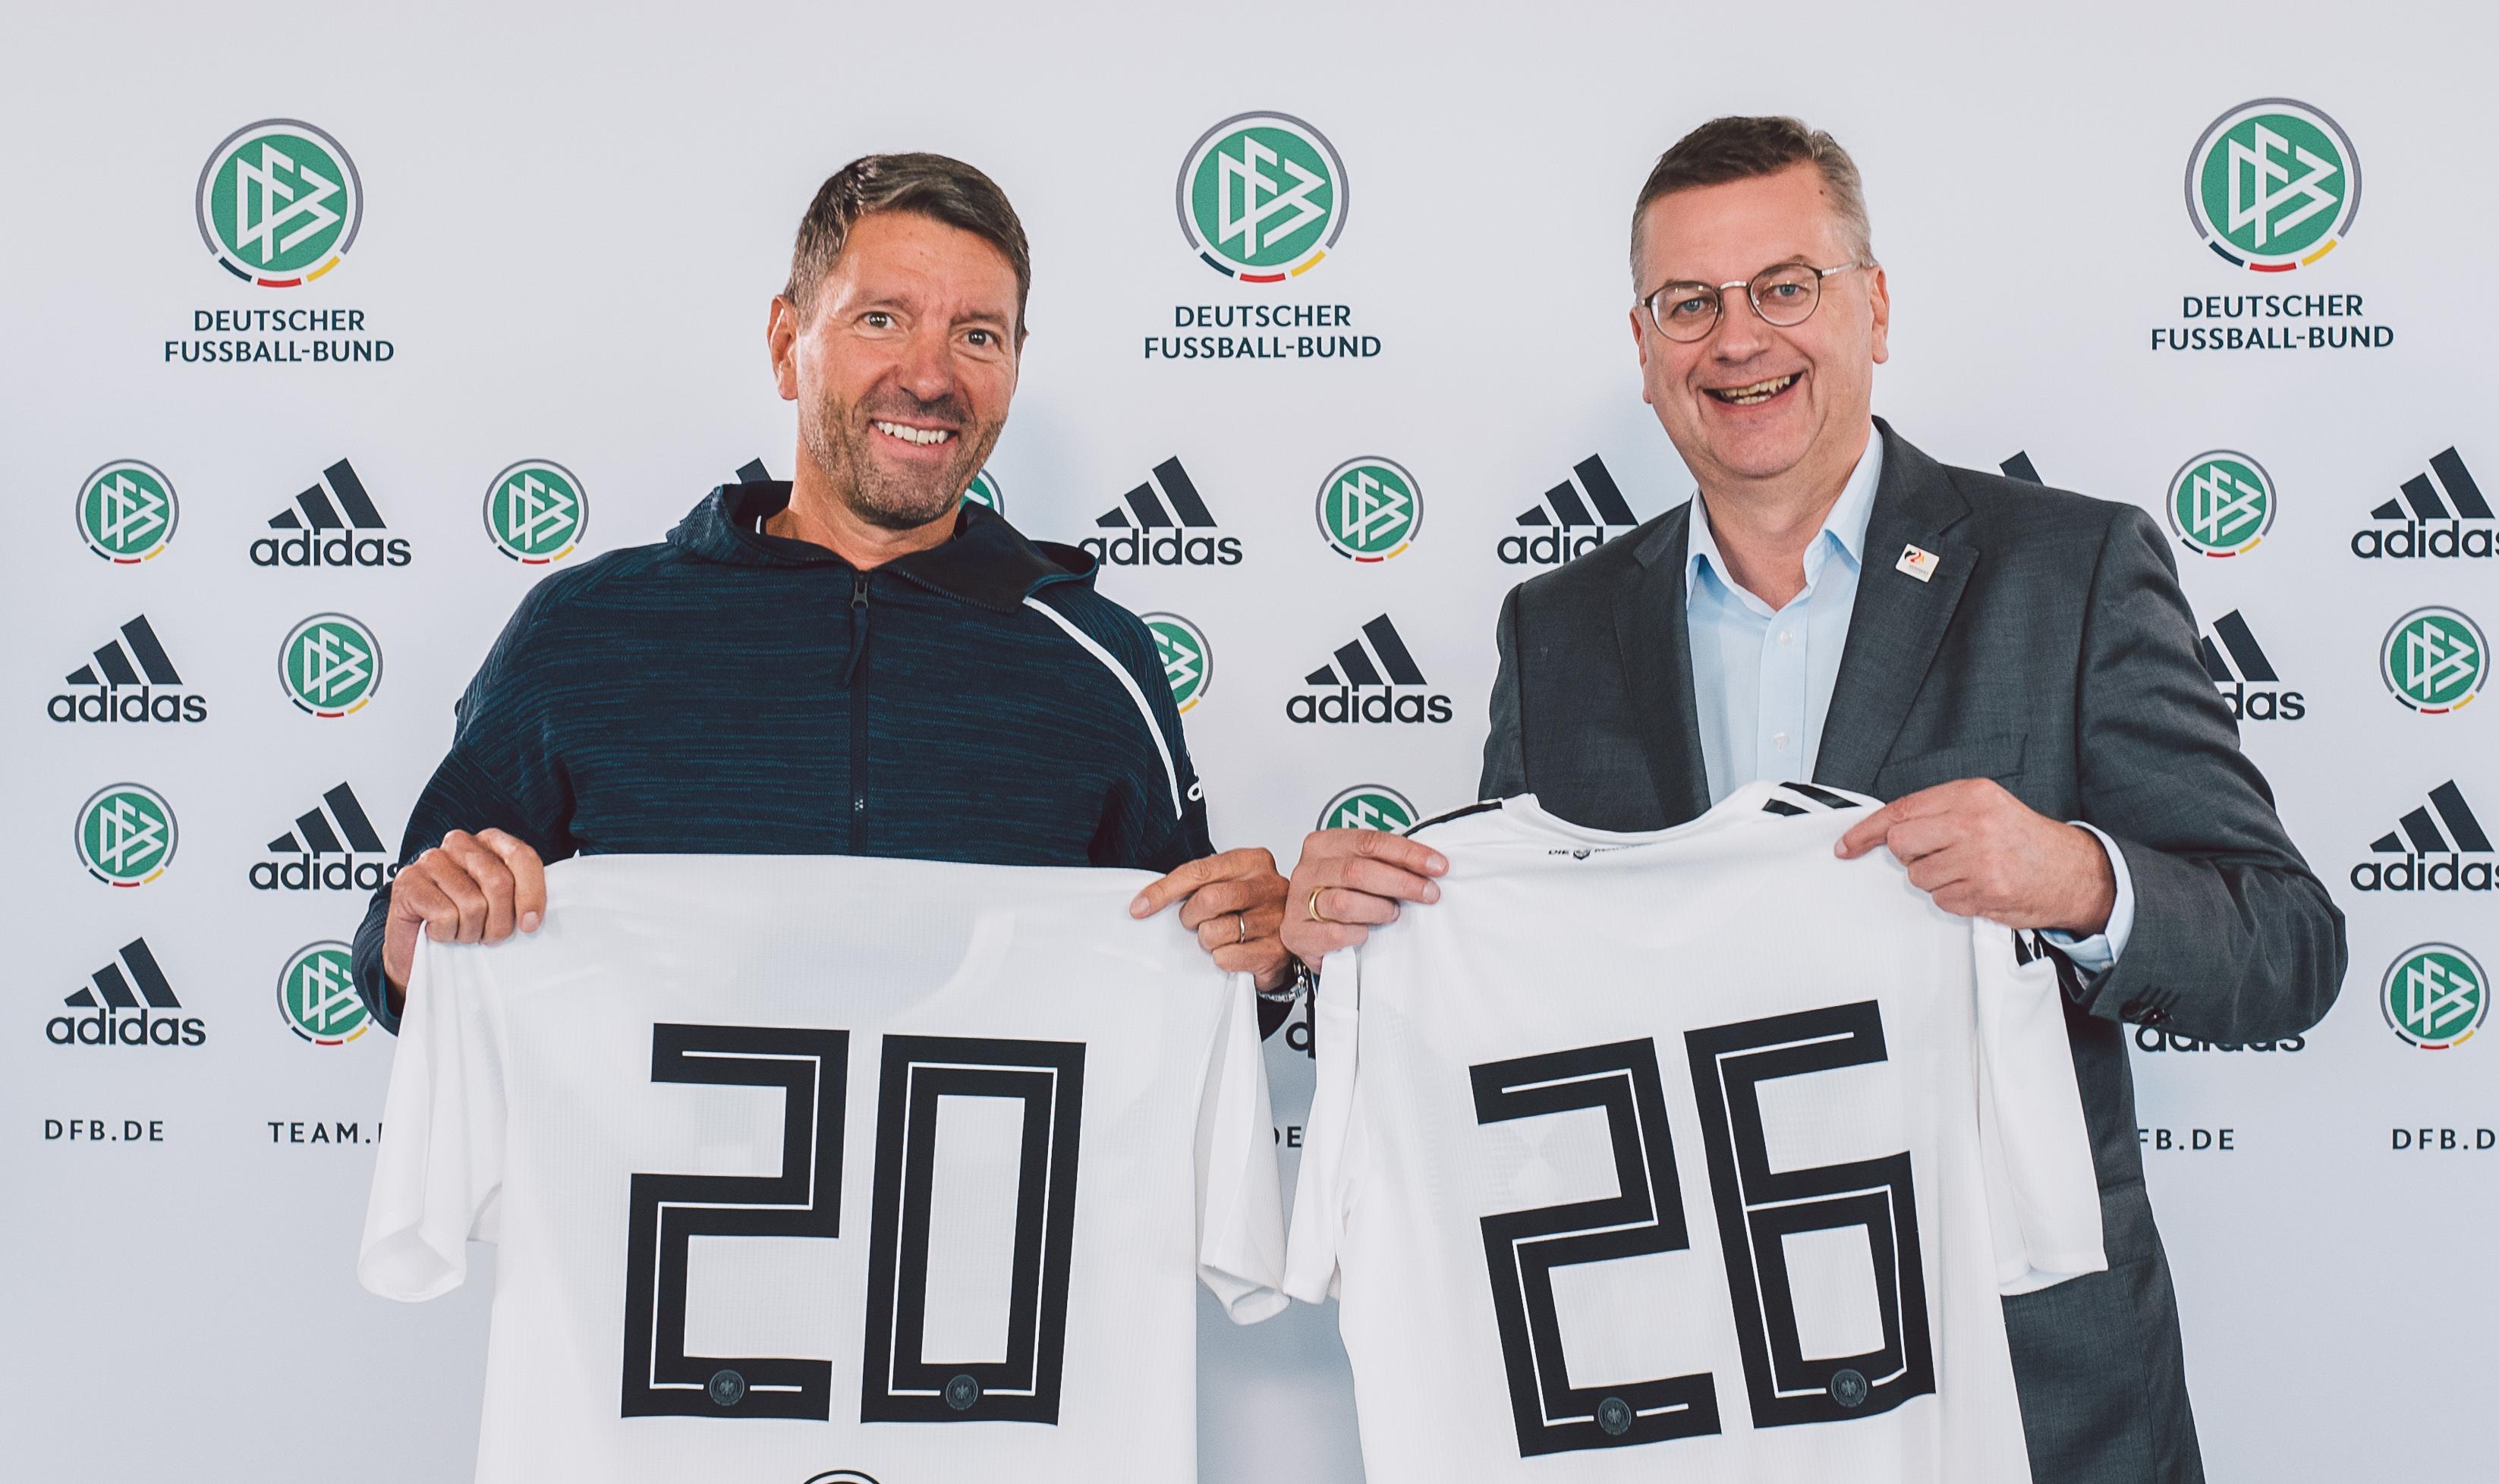 Fußball: DFB verlängert langfristig mit Trikot Ausrüster Adidas